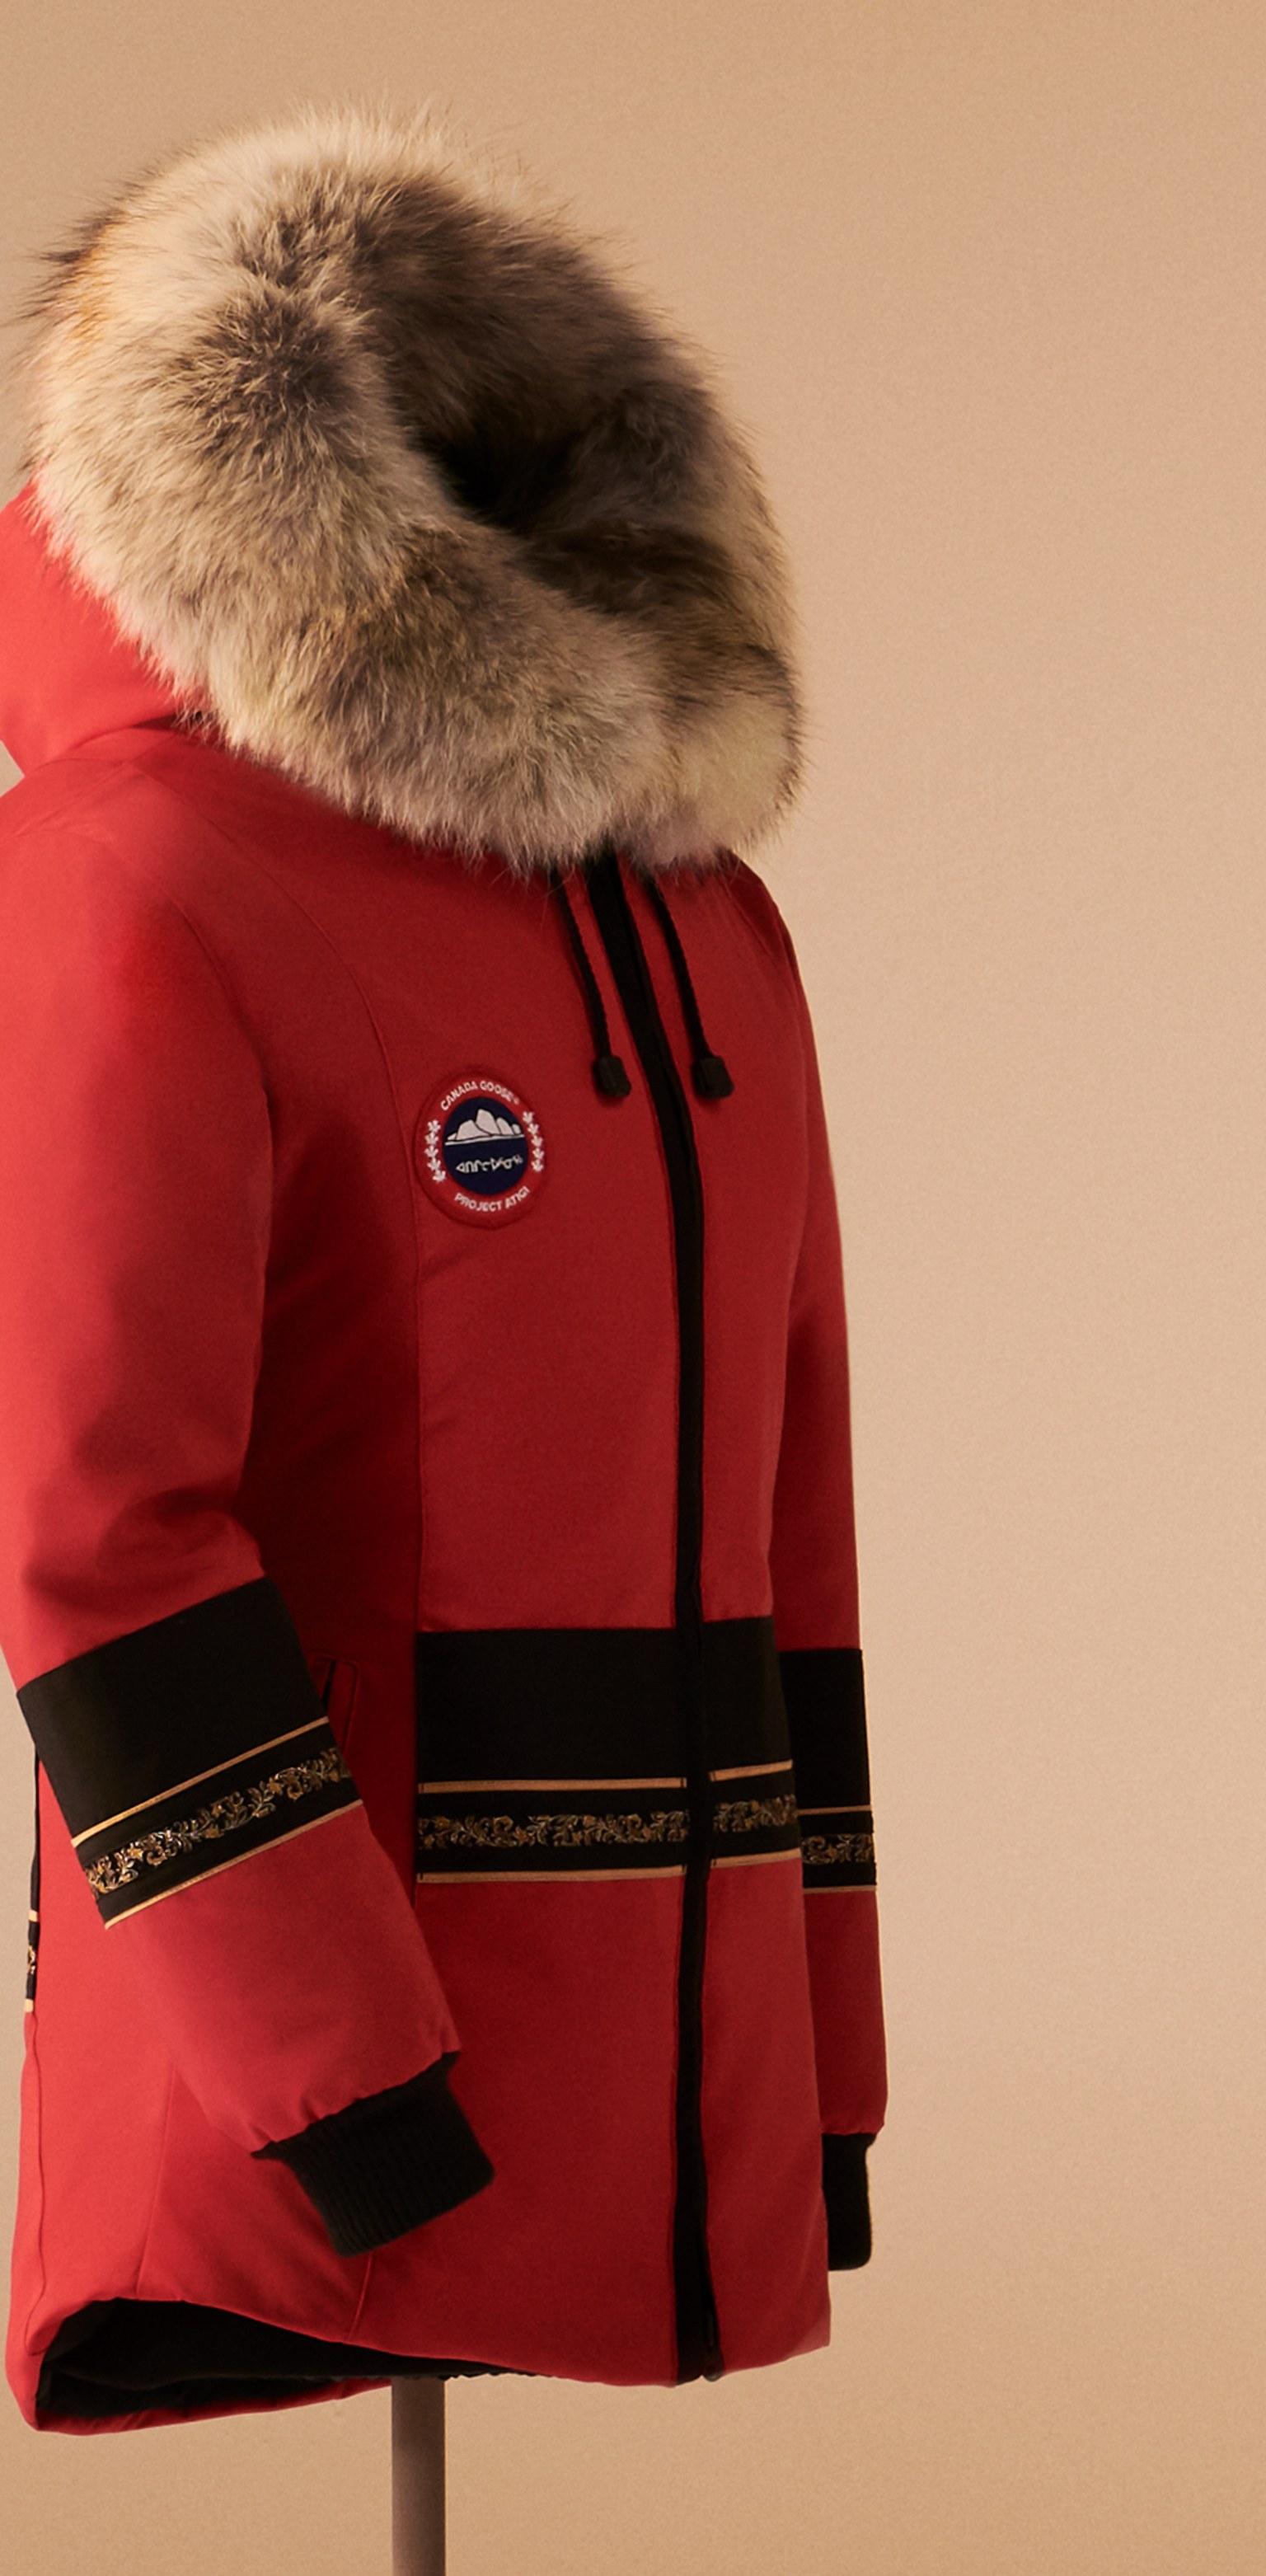 May-Lain Siusangnark | Canada Goose